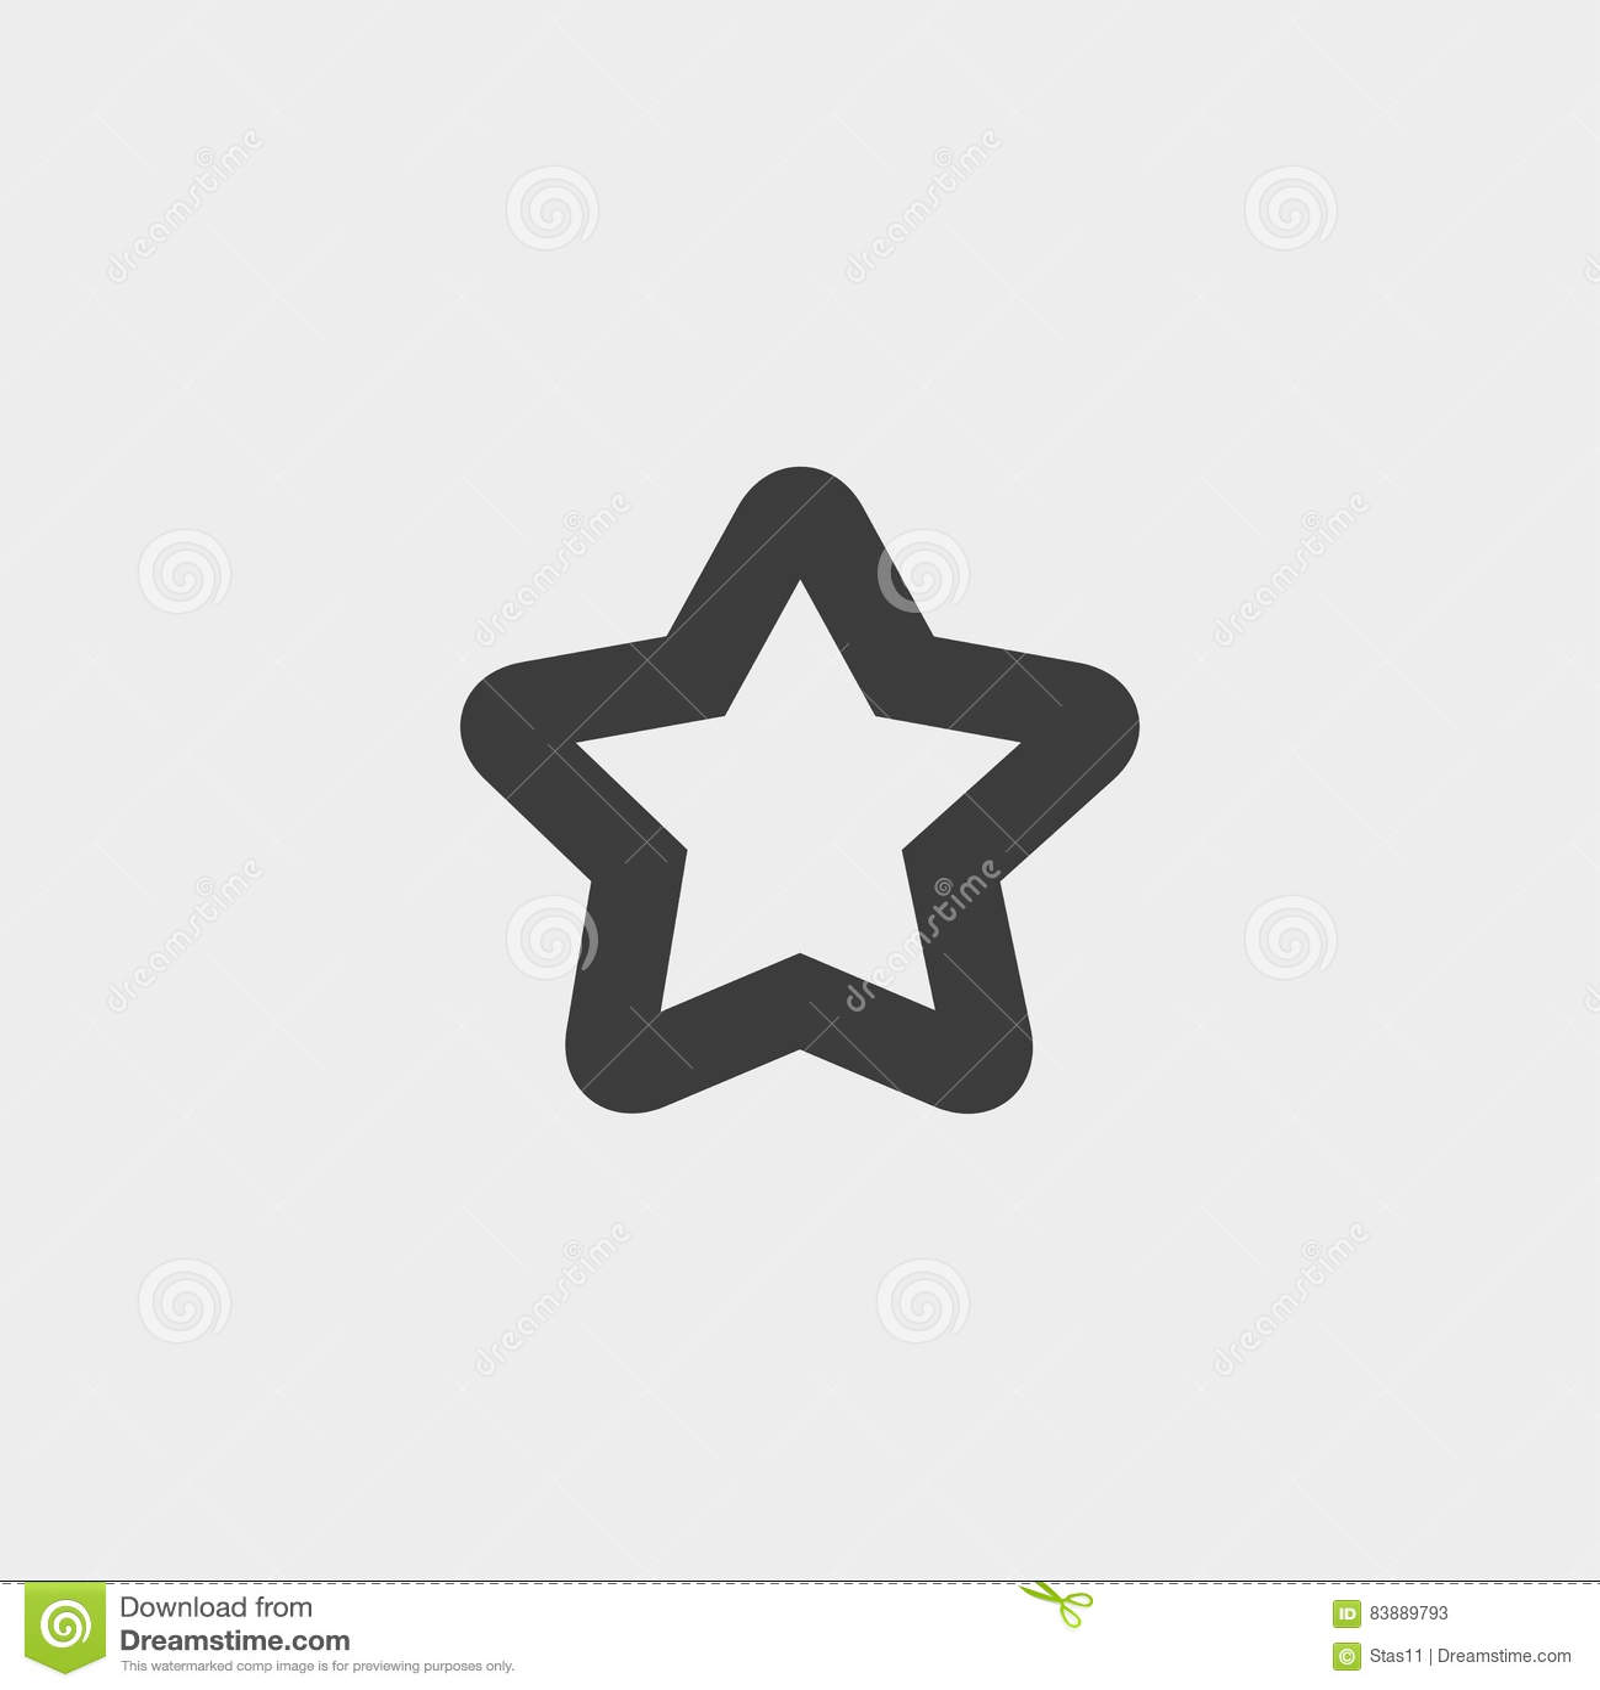 Star Icon In A Flat Design In Black Color  Vector